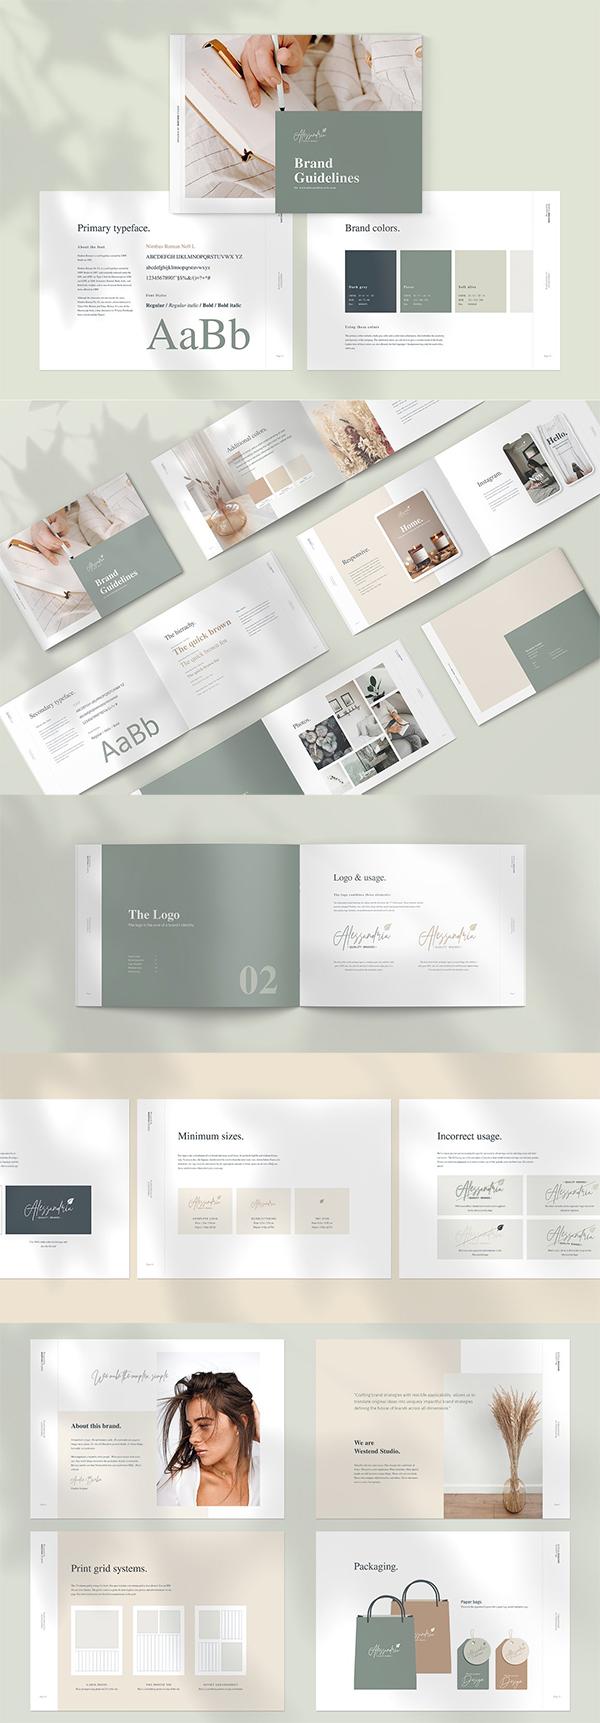 Brand & Logo Guidelines Brochure Template